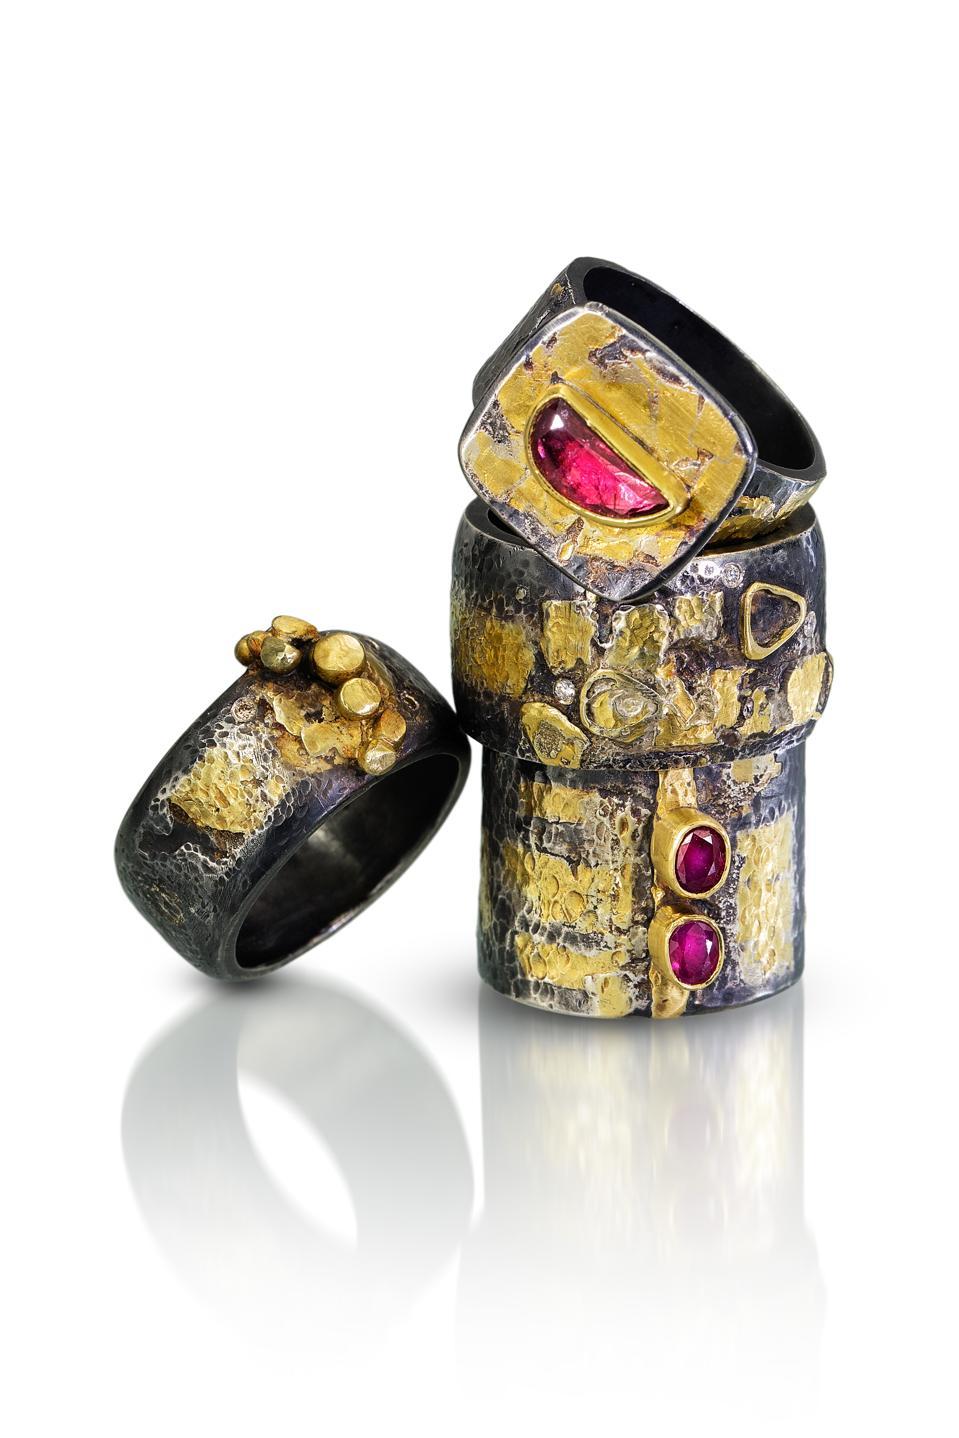 22-karat gold and tourmaline rings by Deborah Meyer  embody the essence of luxury jewelry